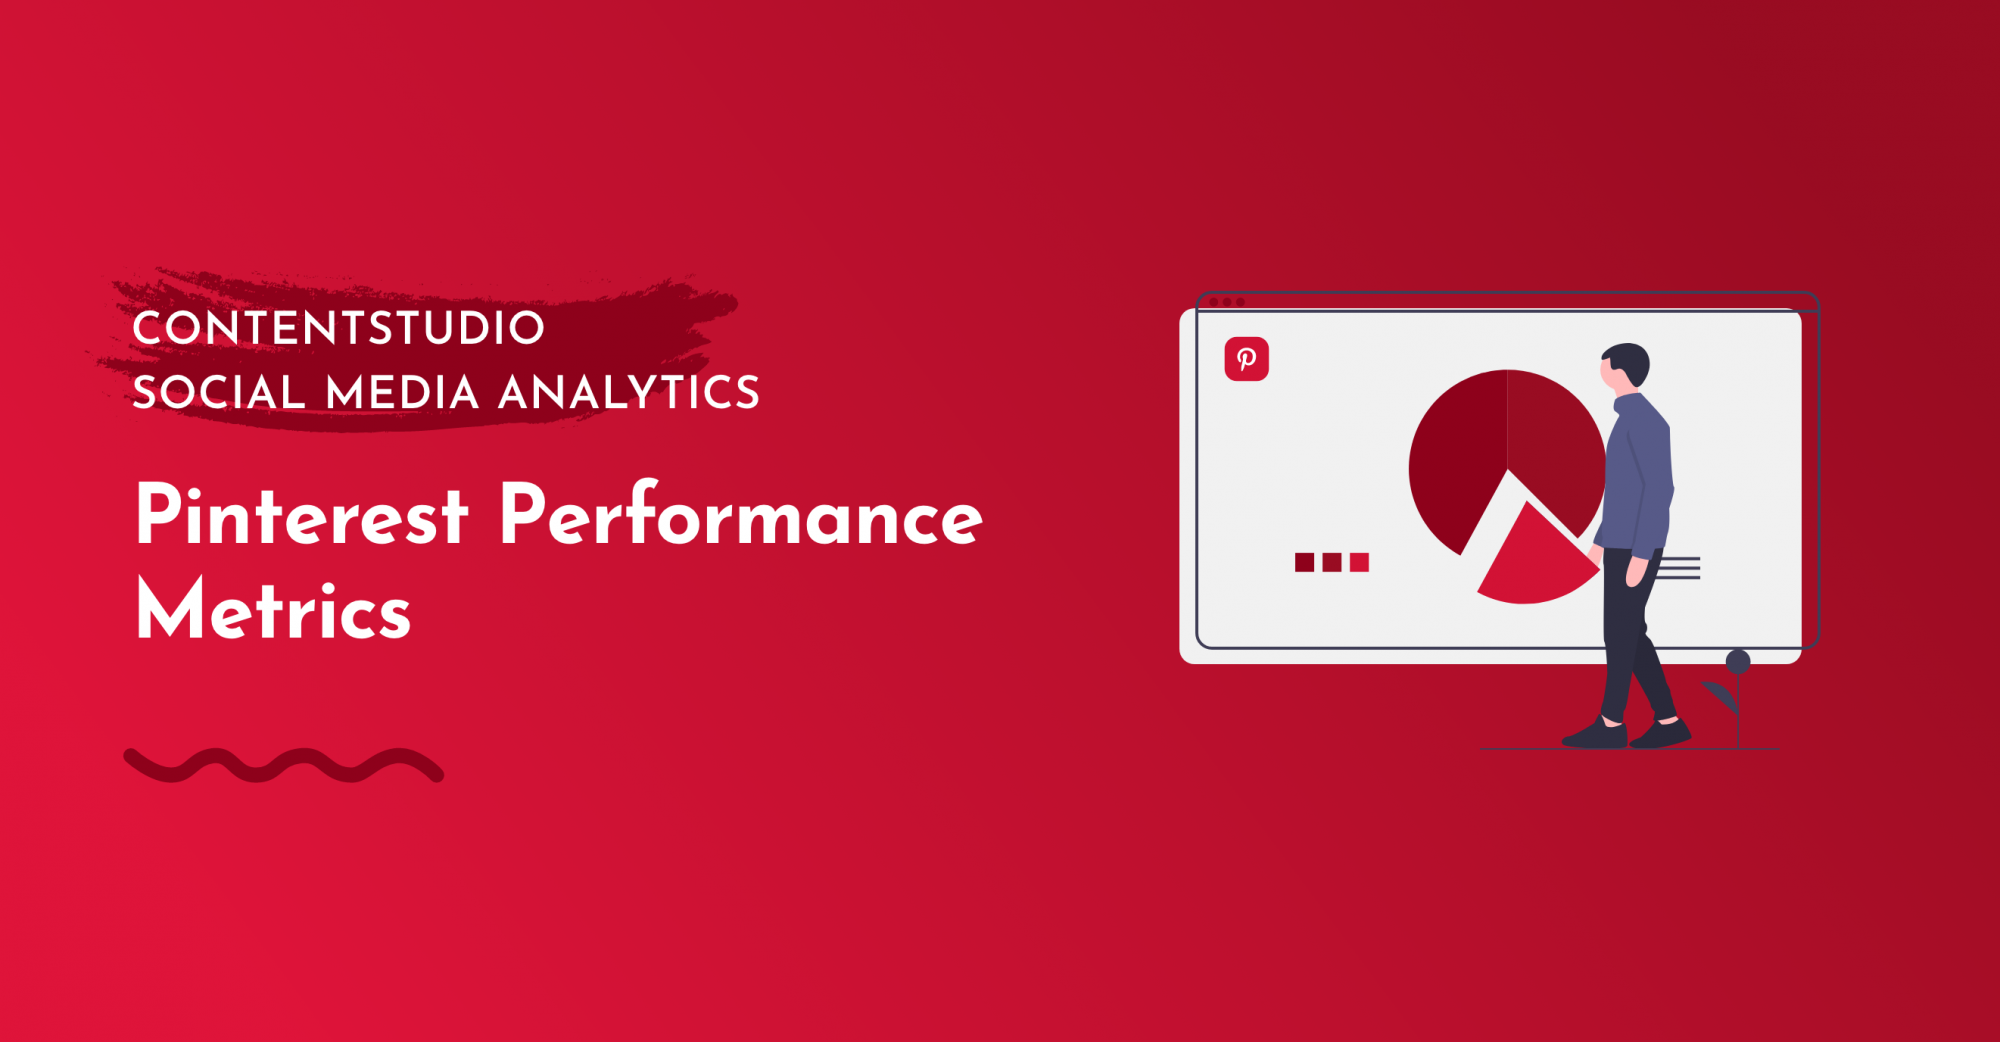 Pinterest Performance Metrics